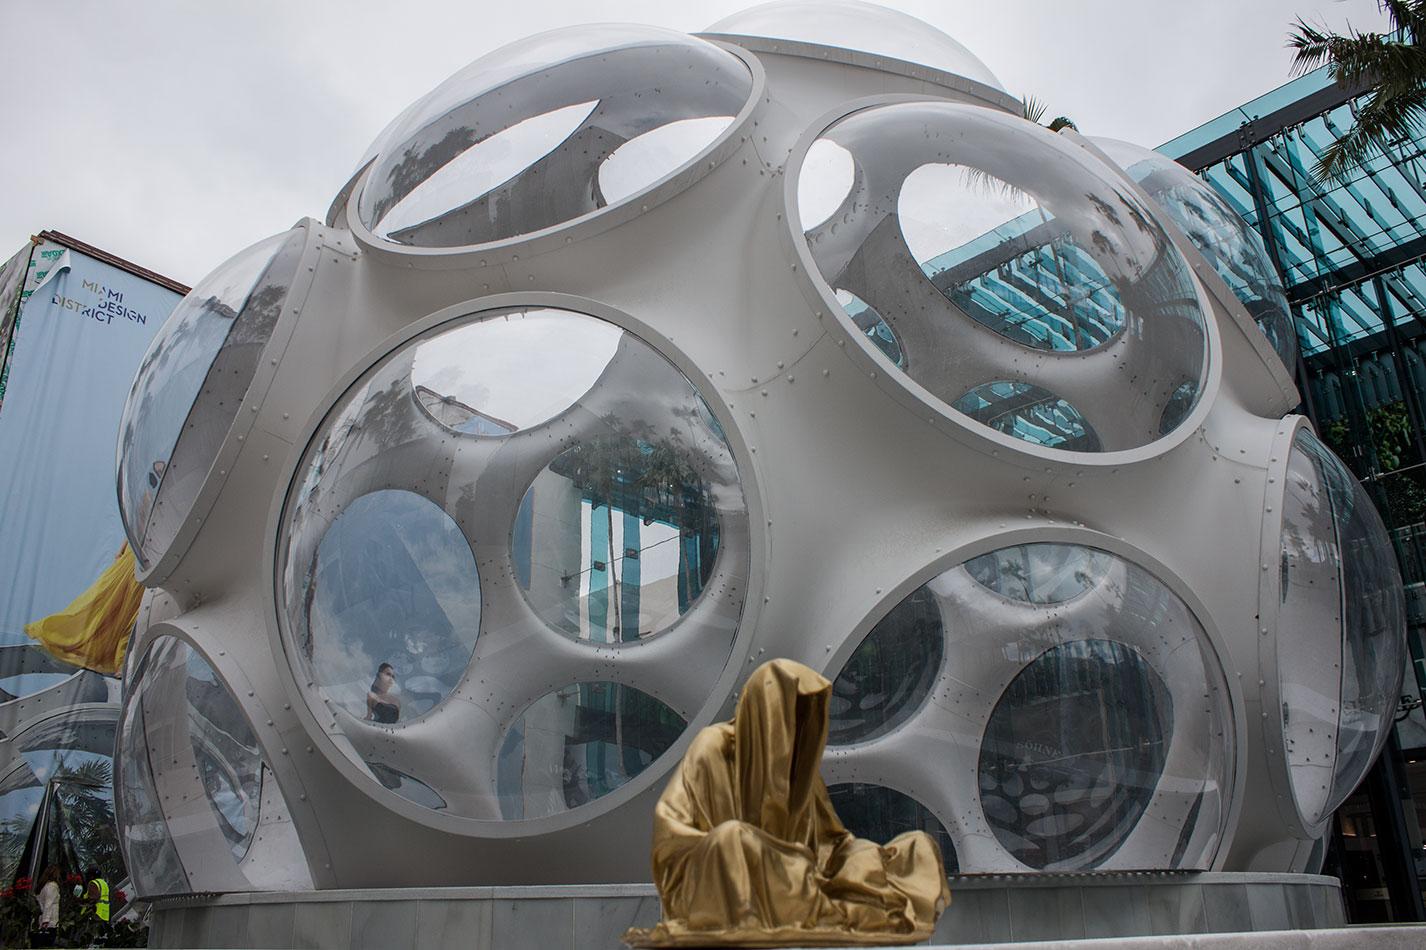 public-art-basel-miami-beach-fair-usa-florida-bass-museum-guardians-of-time-manfred-kili-kielnhofer-contemporary-fine-art-modern-arts-design-antiques-sculpture-6645